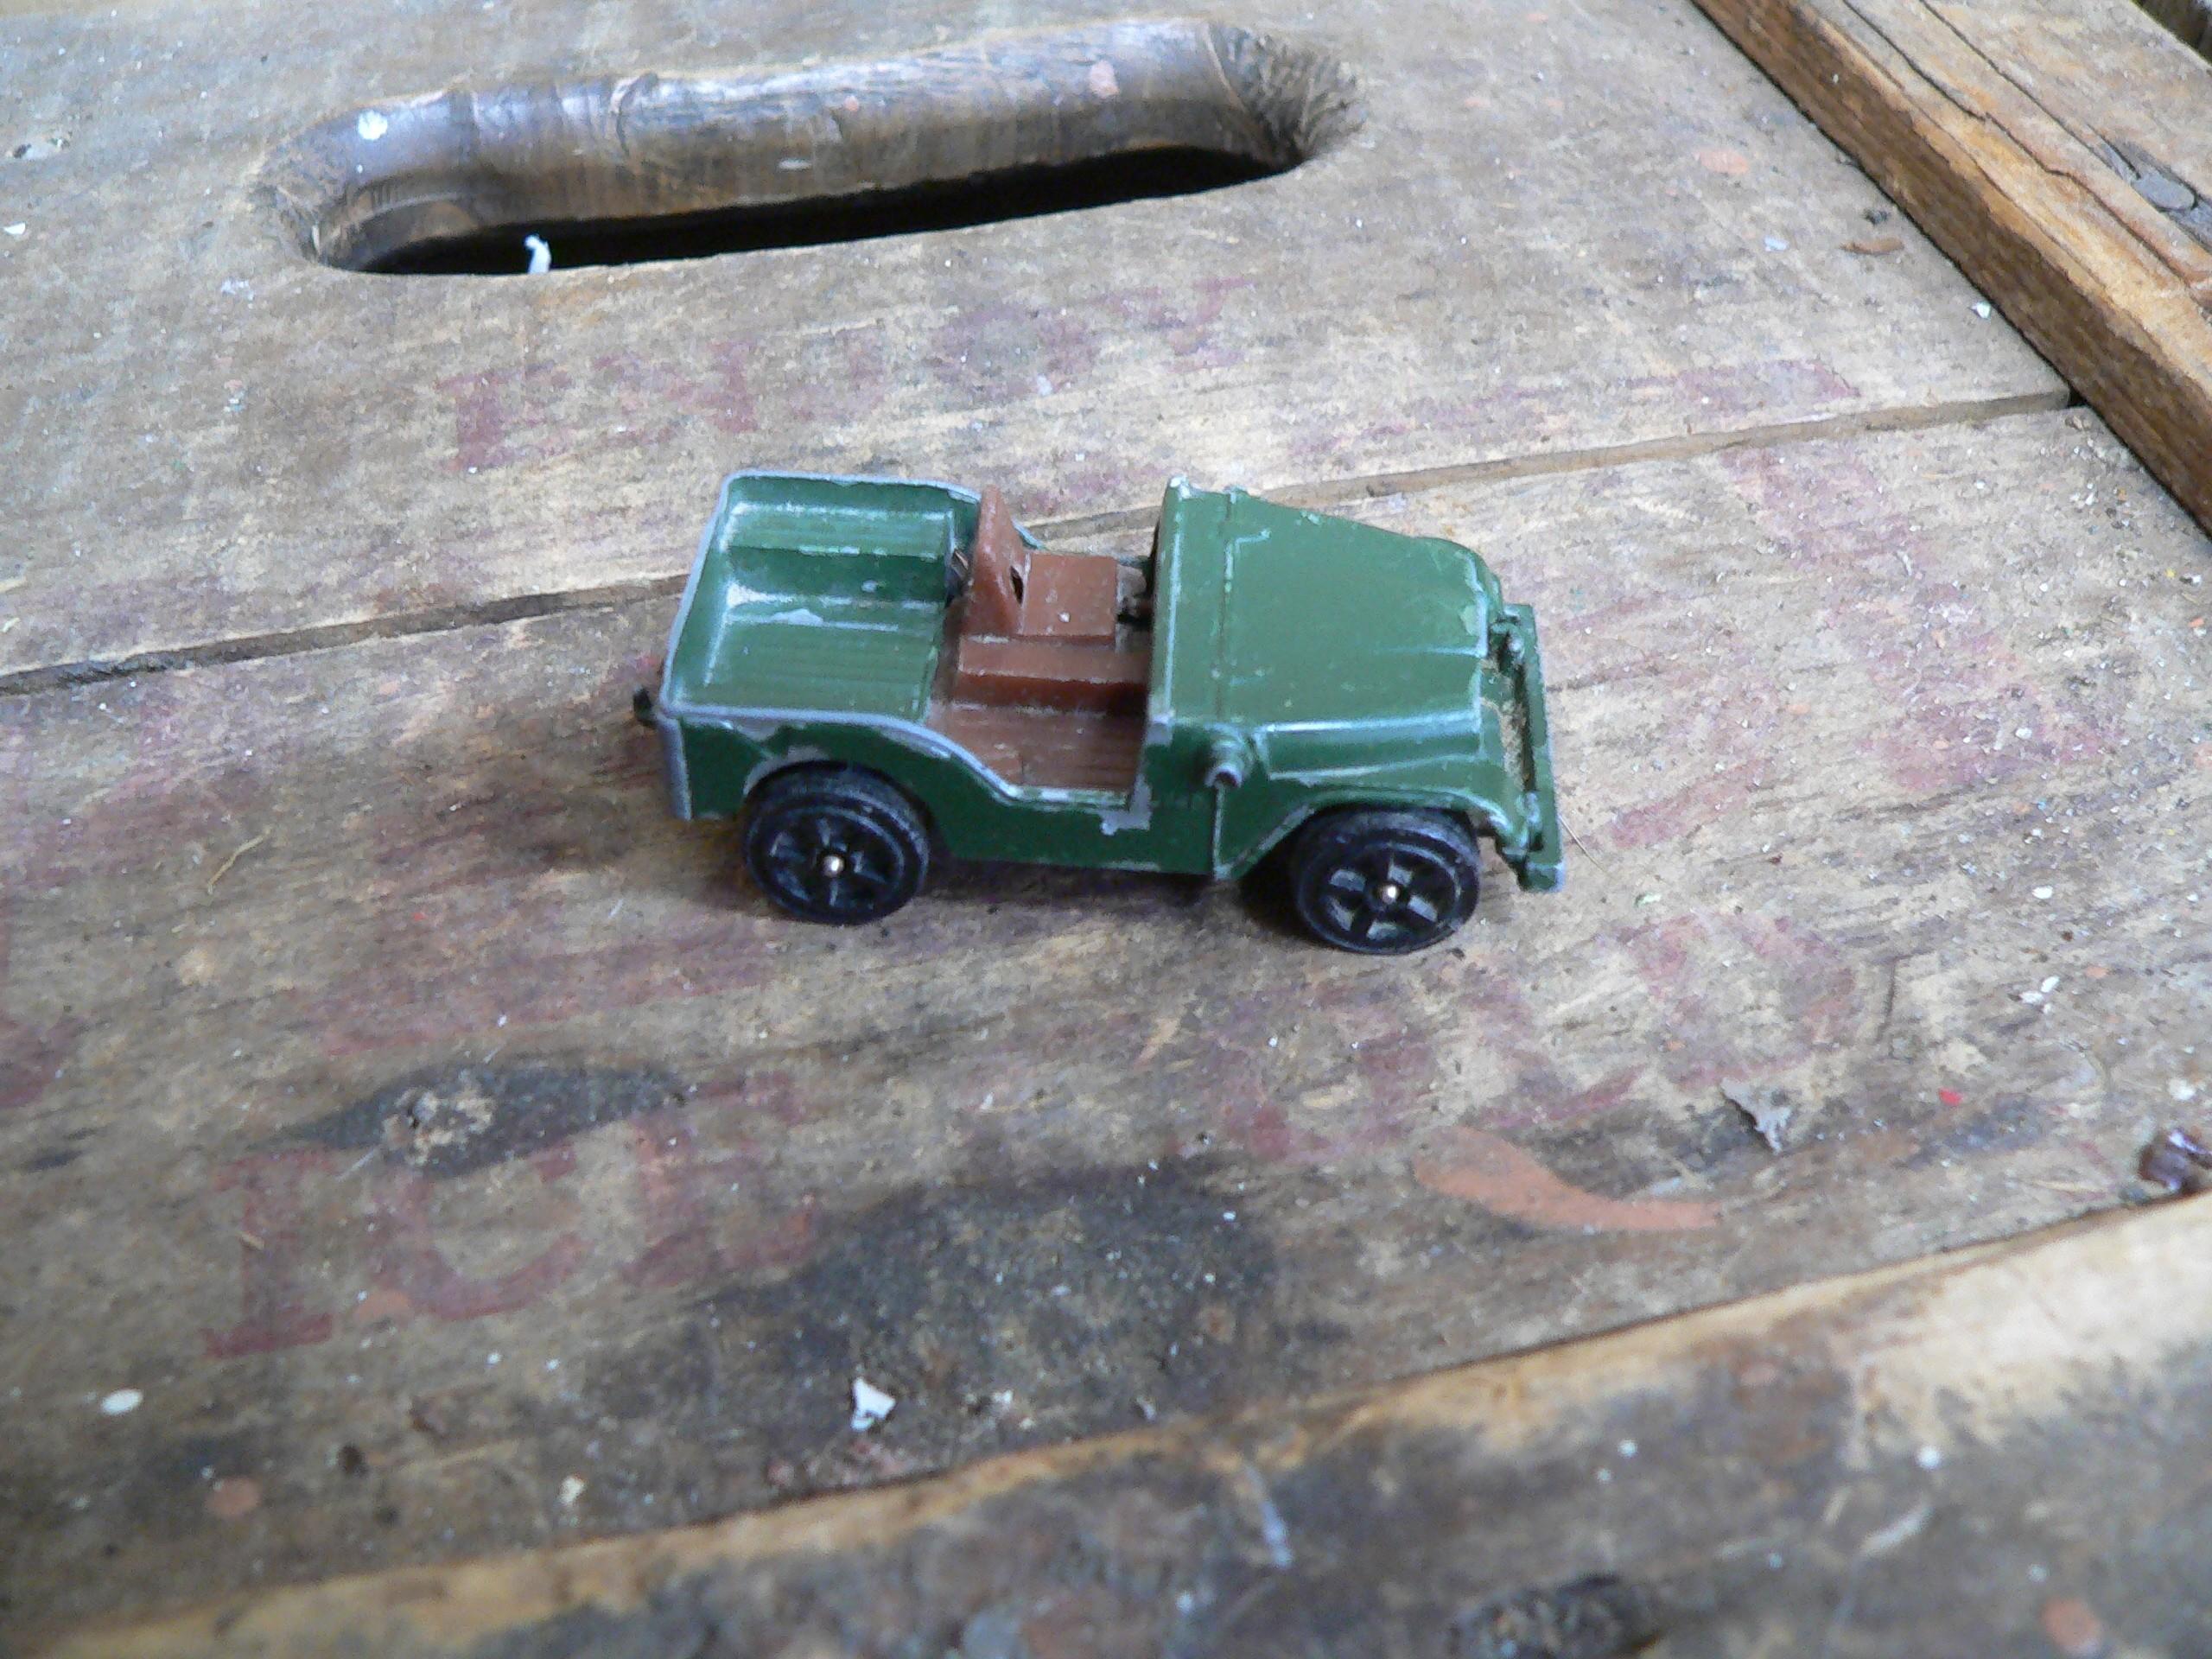 Corgi juniors willys jeep # 6199.12